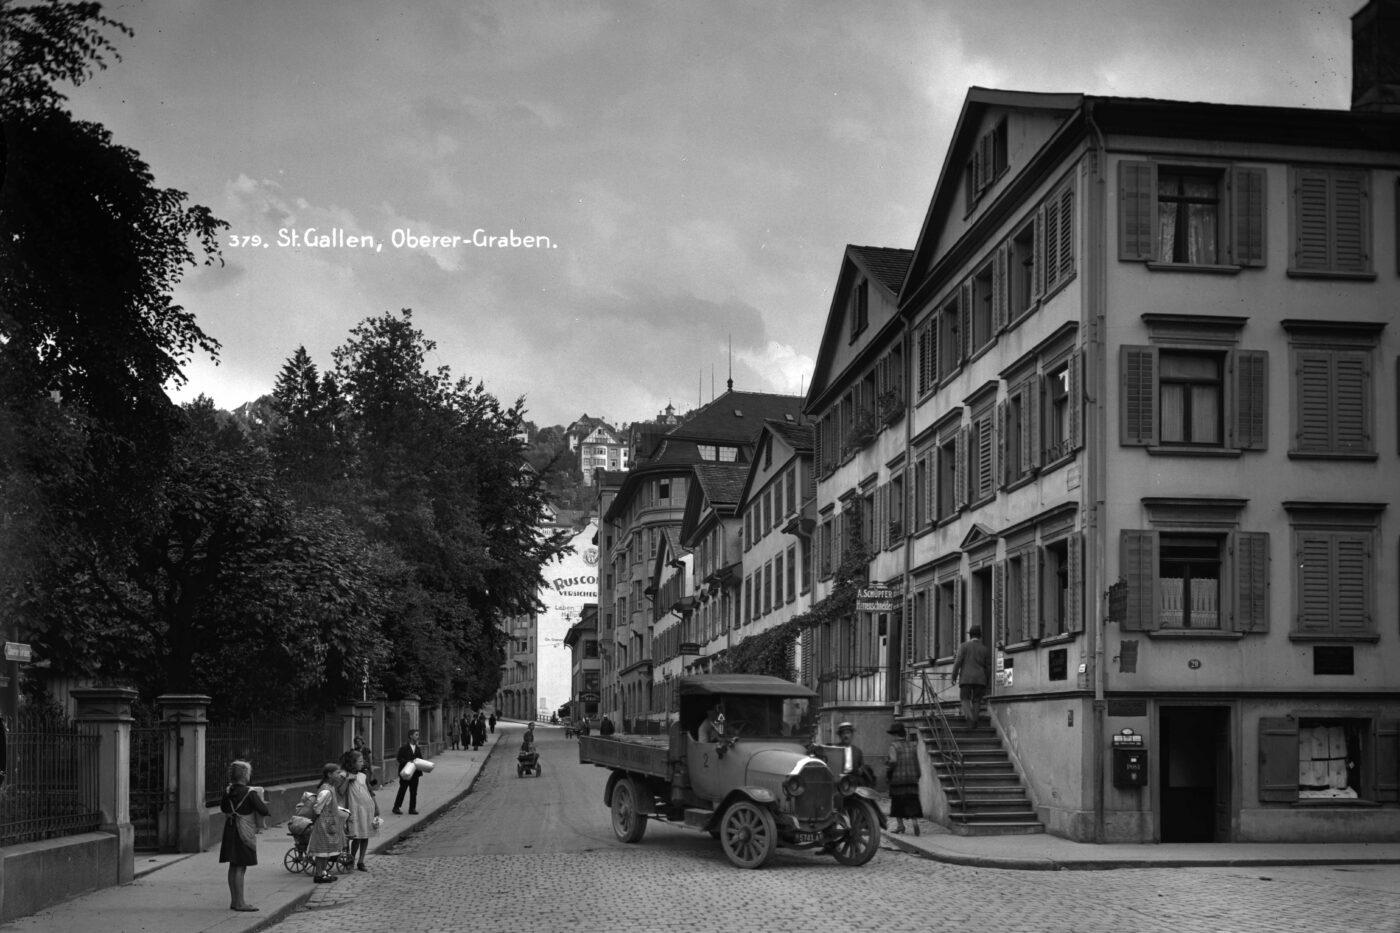 2019 und 1925: Altstadt, Oberer Graben